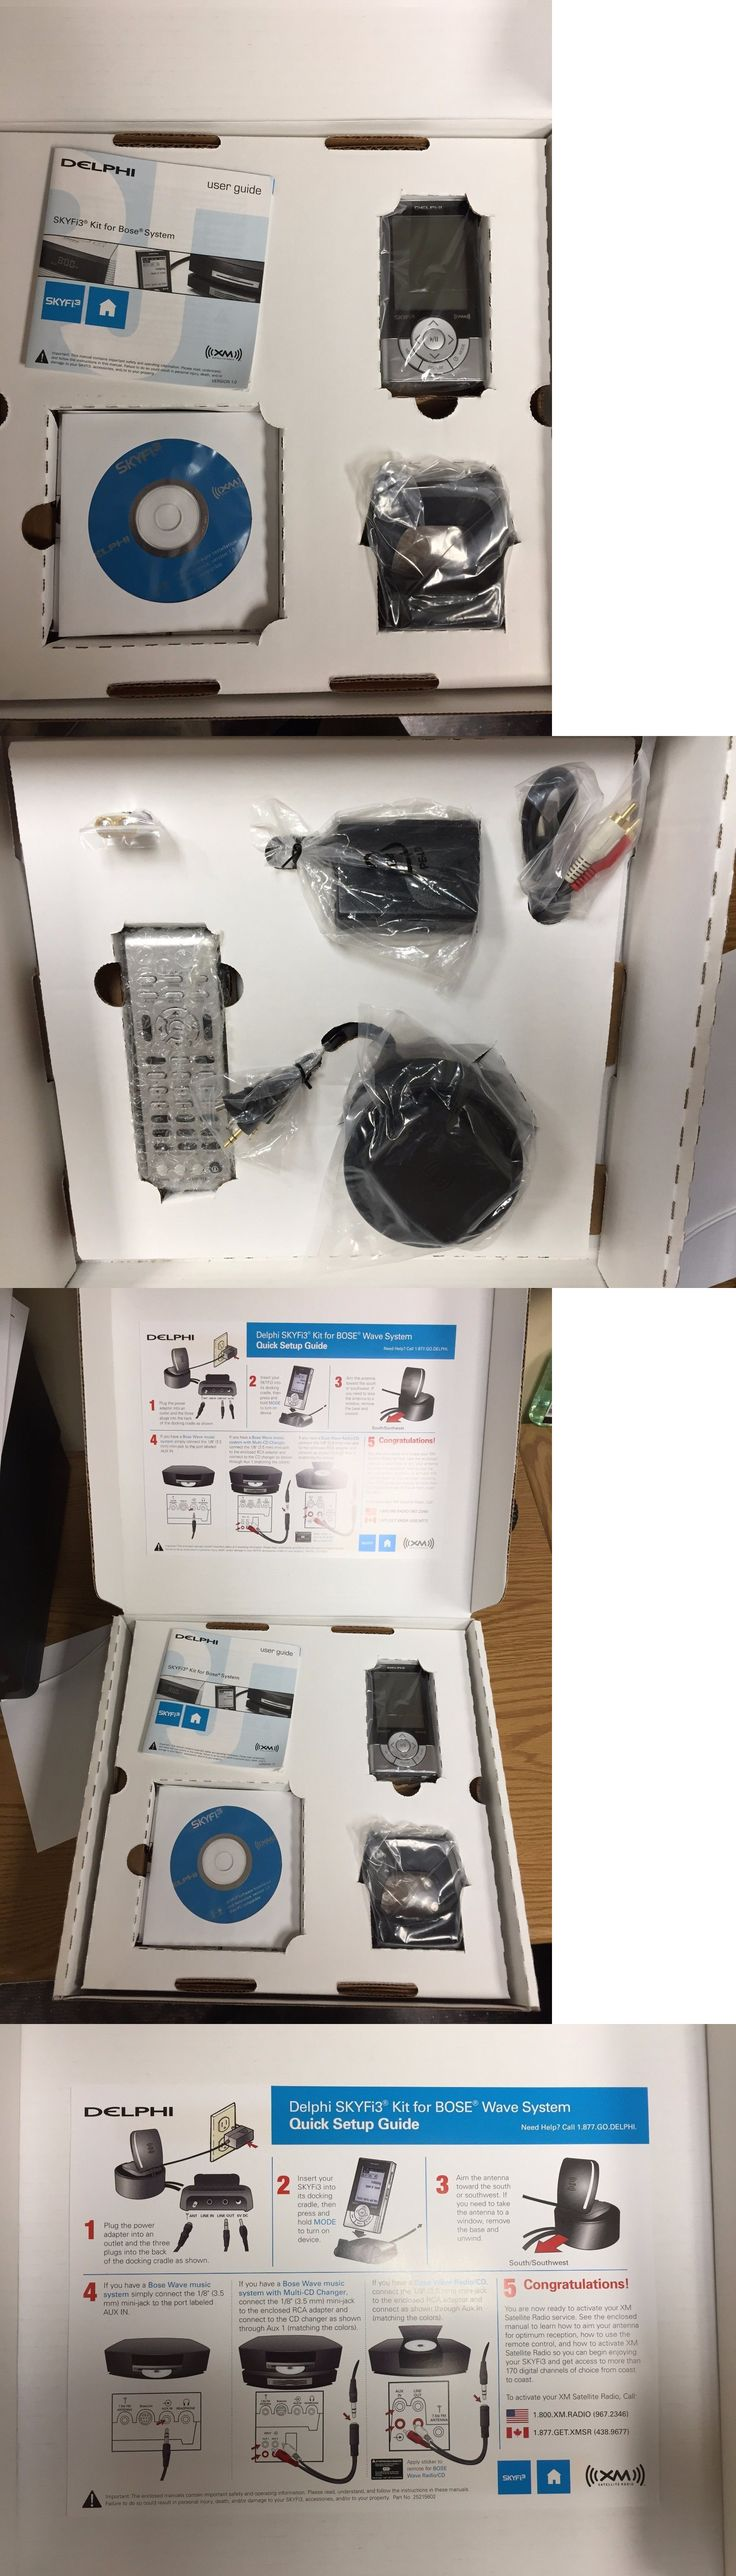 Portable Satellite Radios: Delphi Skyfi3 Xm Satellite Radio Kit For Bose System Receiver And Home Kit Sa10219 -> BUY IT NOW ONLY: $35.0 on eBay!